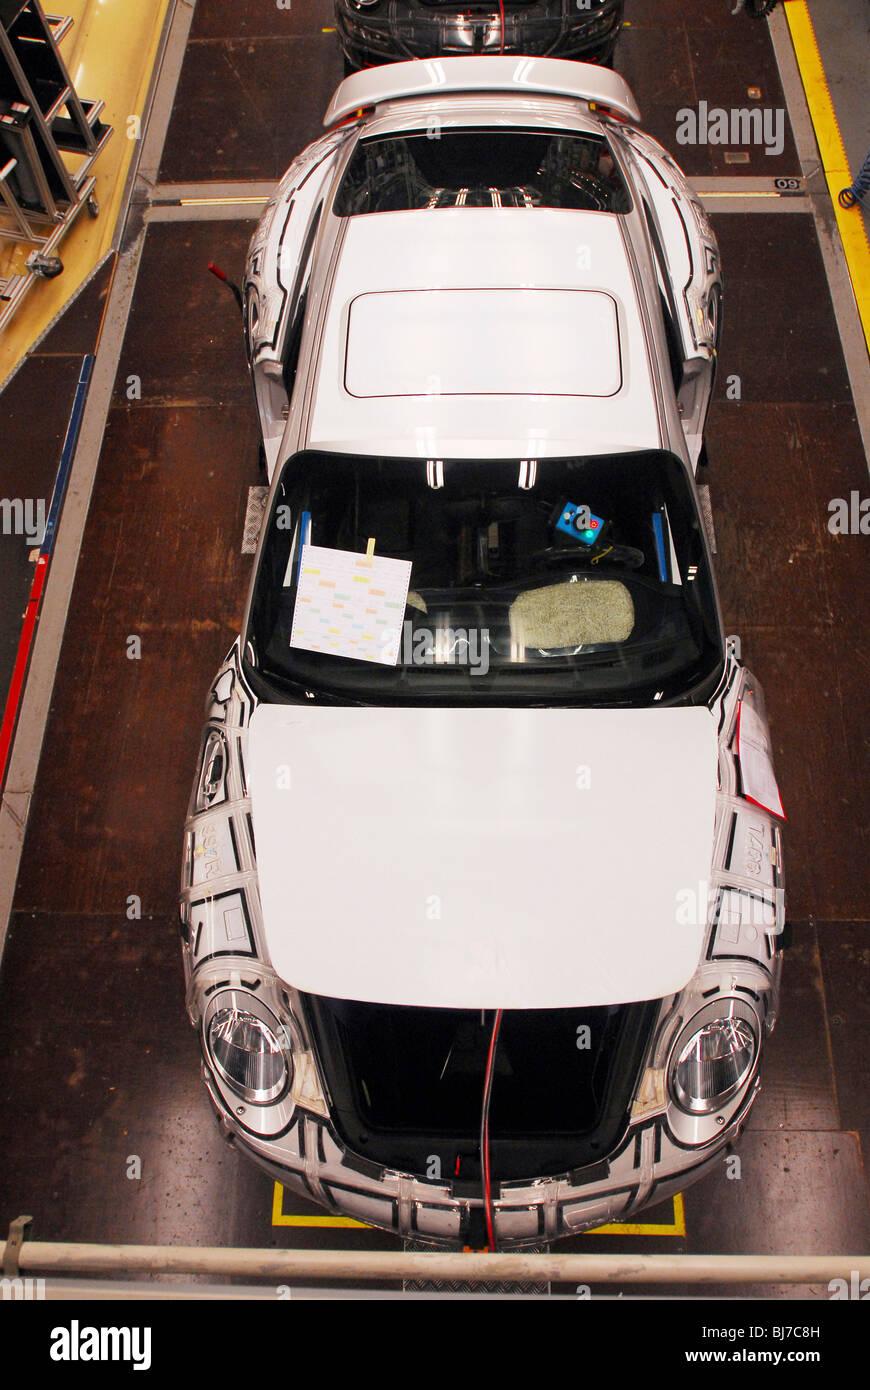 Porsche Carrera production line, Stuttgart, Germany - Stock Image